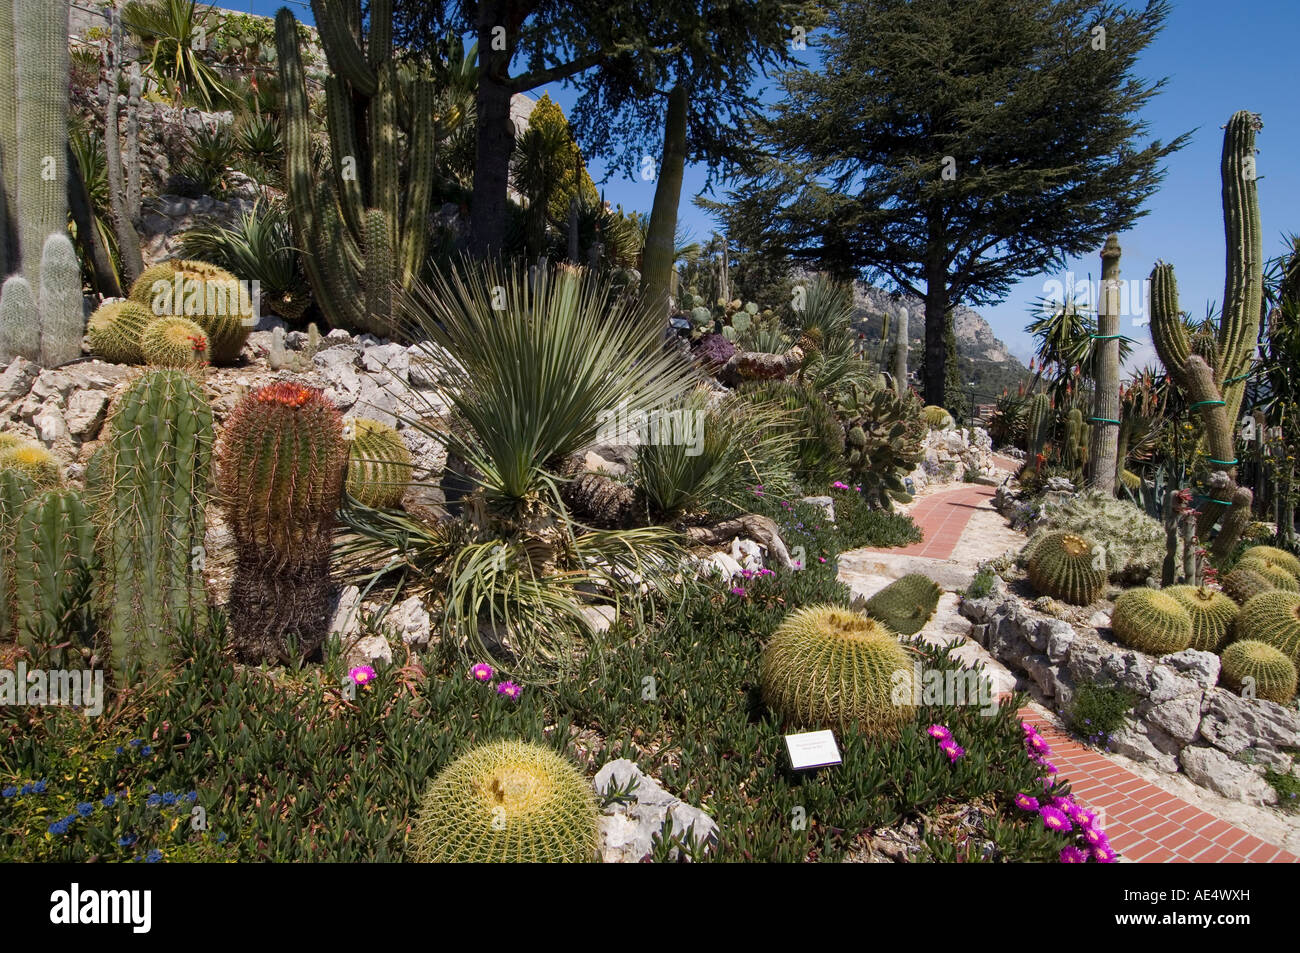 Photo Petit Jardin Exotique botanic garden (jardin exotique), eze village, alpes